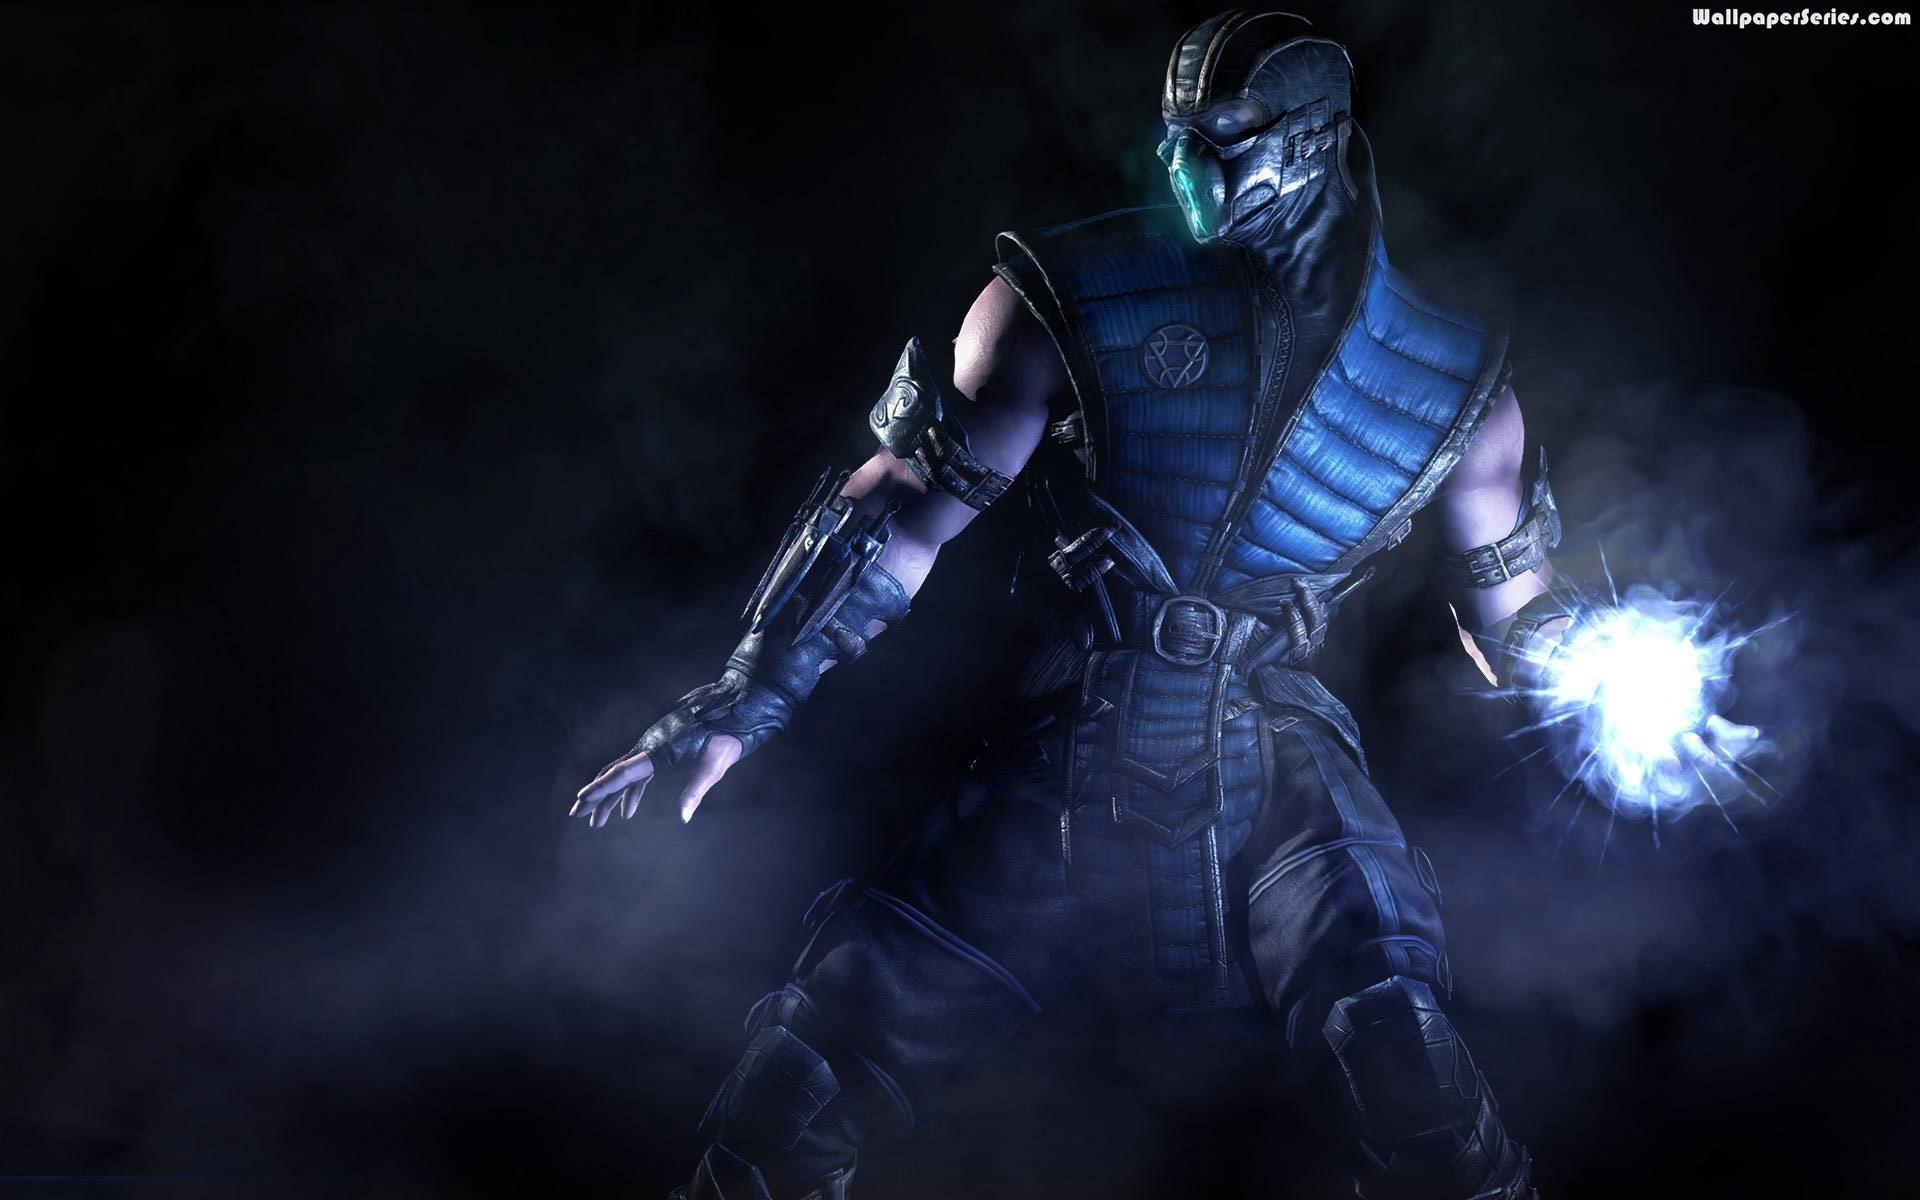 Mortal Kombat X Wallpapers: Mortal Kombat X Wallpaper HD (72+ Images